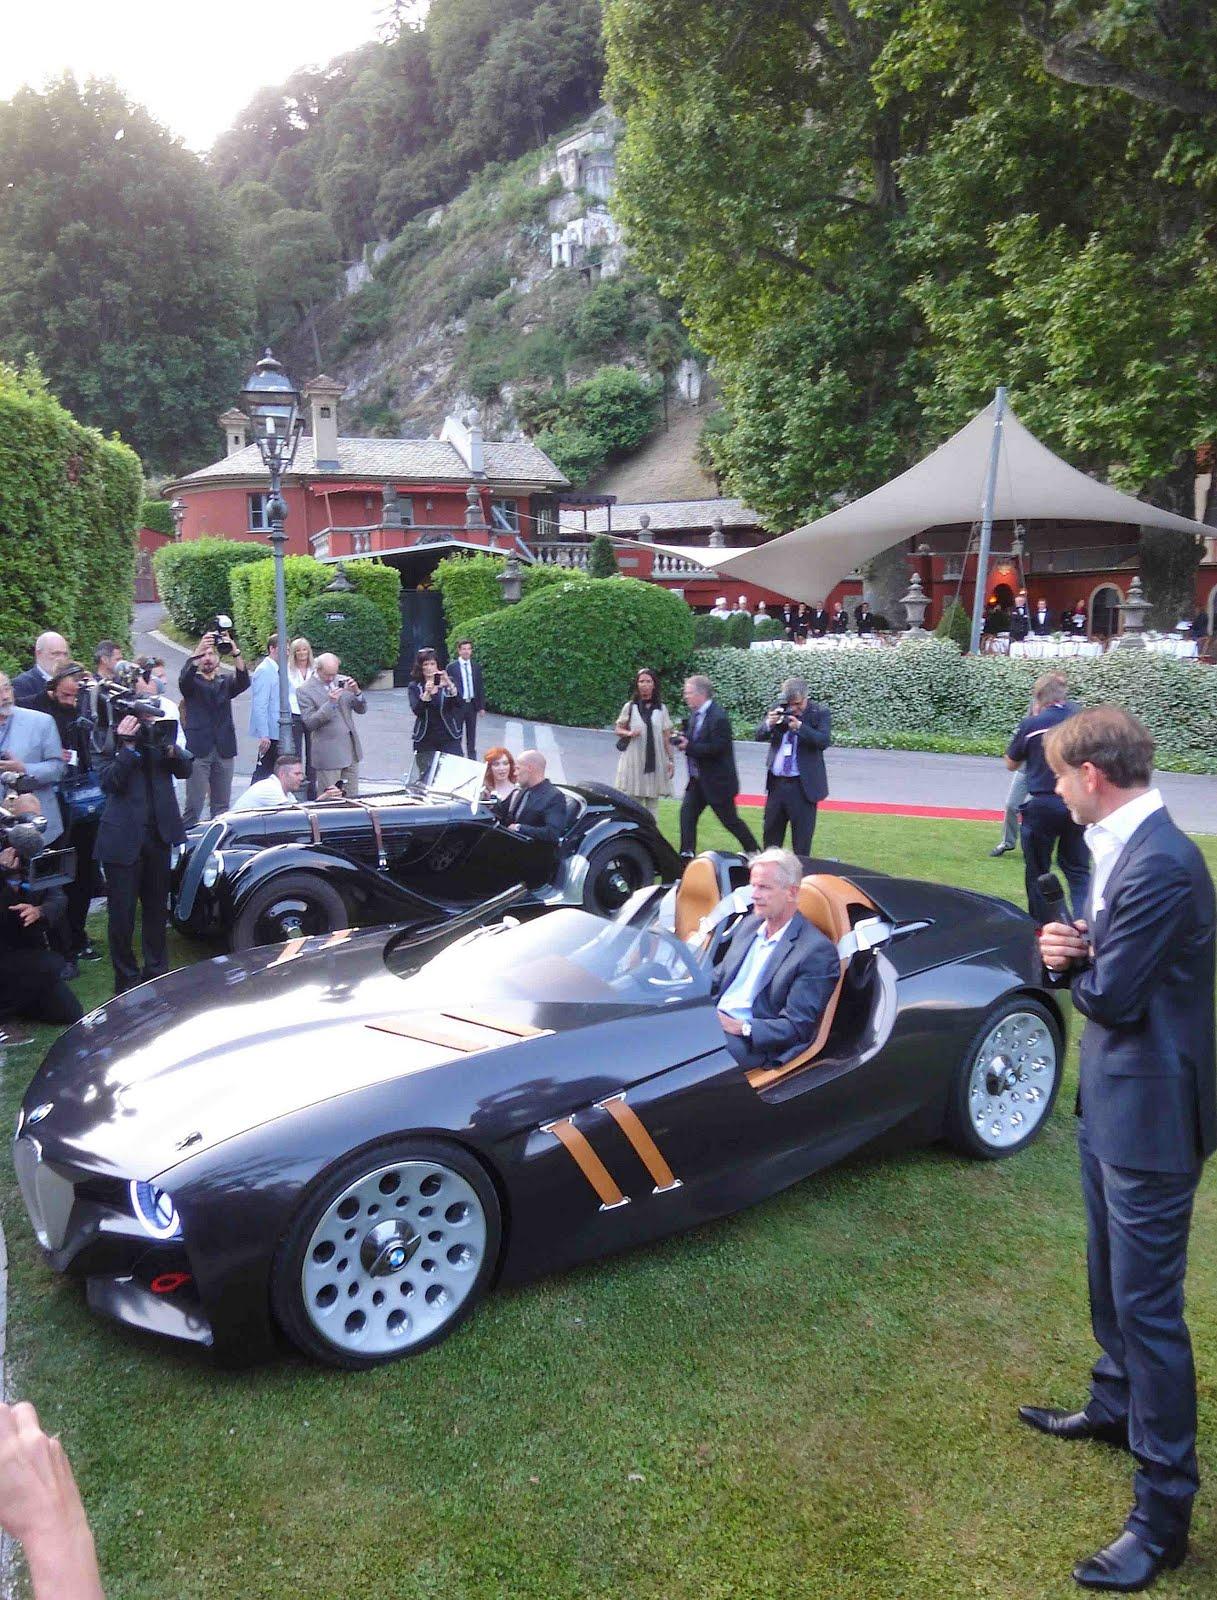 prototype car at the Villa